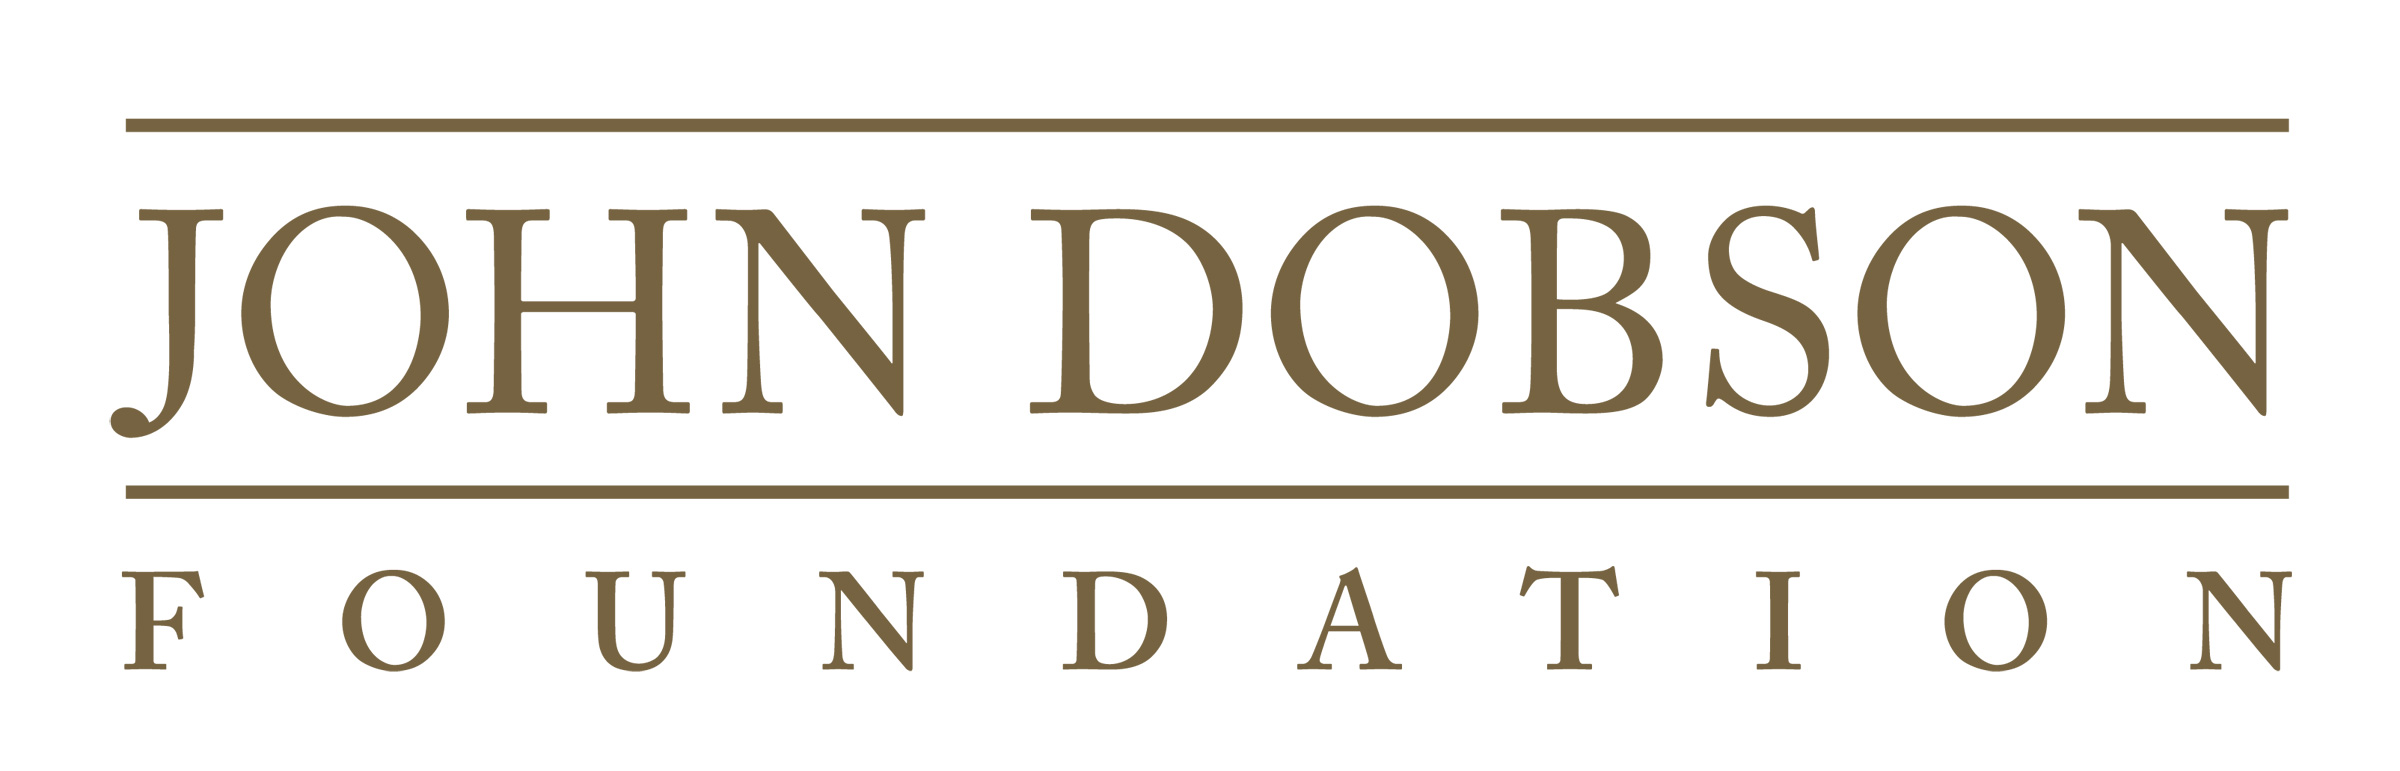 The John Dobson Foundation